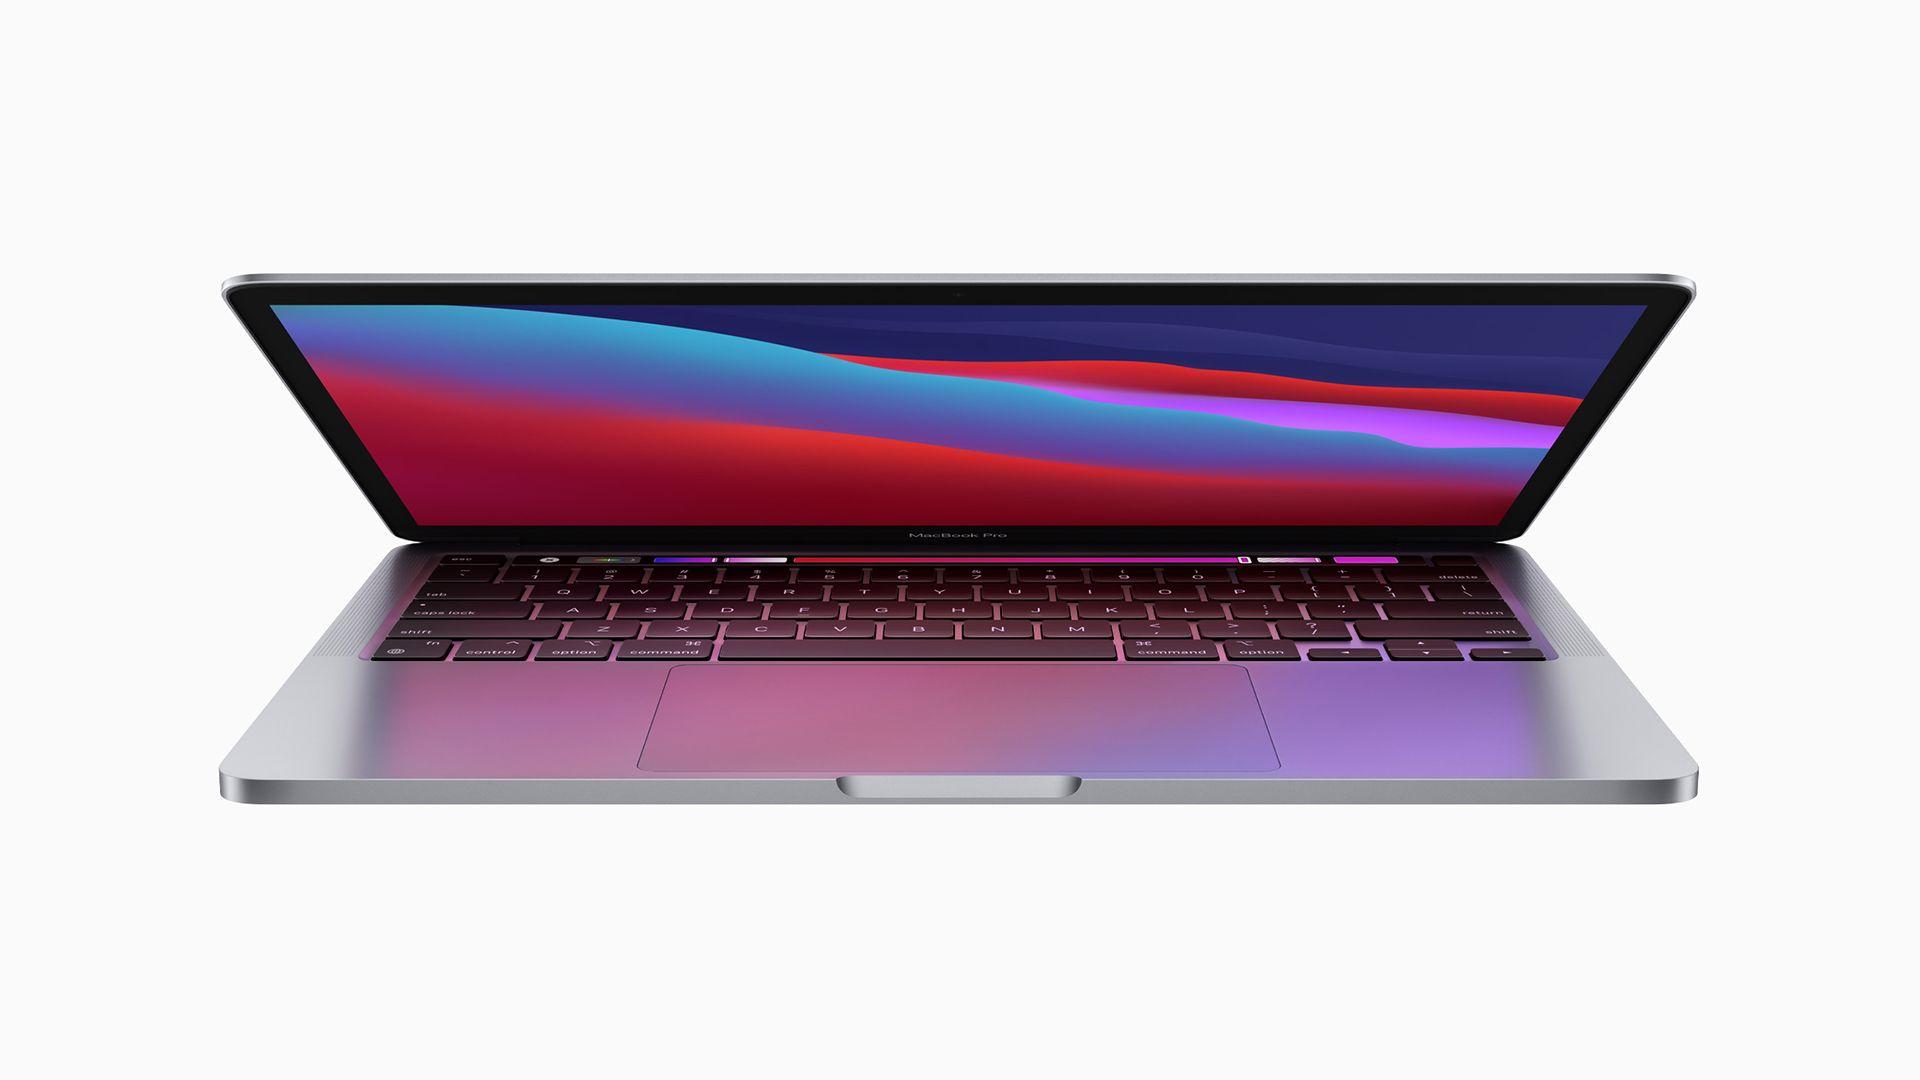 MacBook Pro com Apple M1. (Foto: Divulgação/Apple)